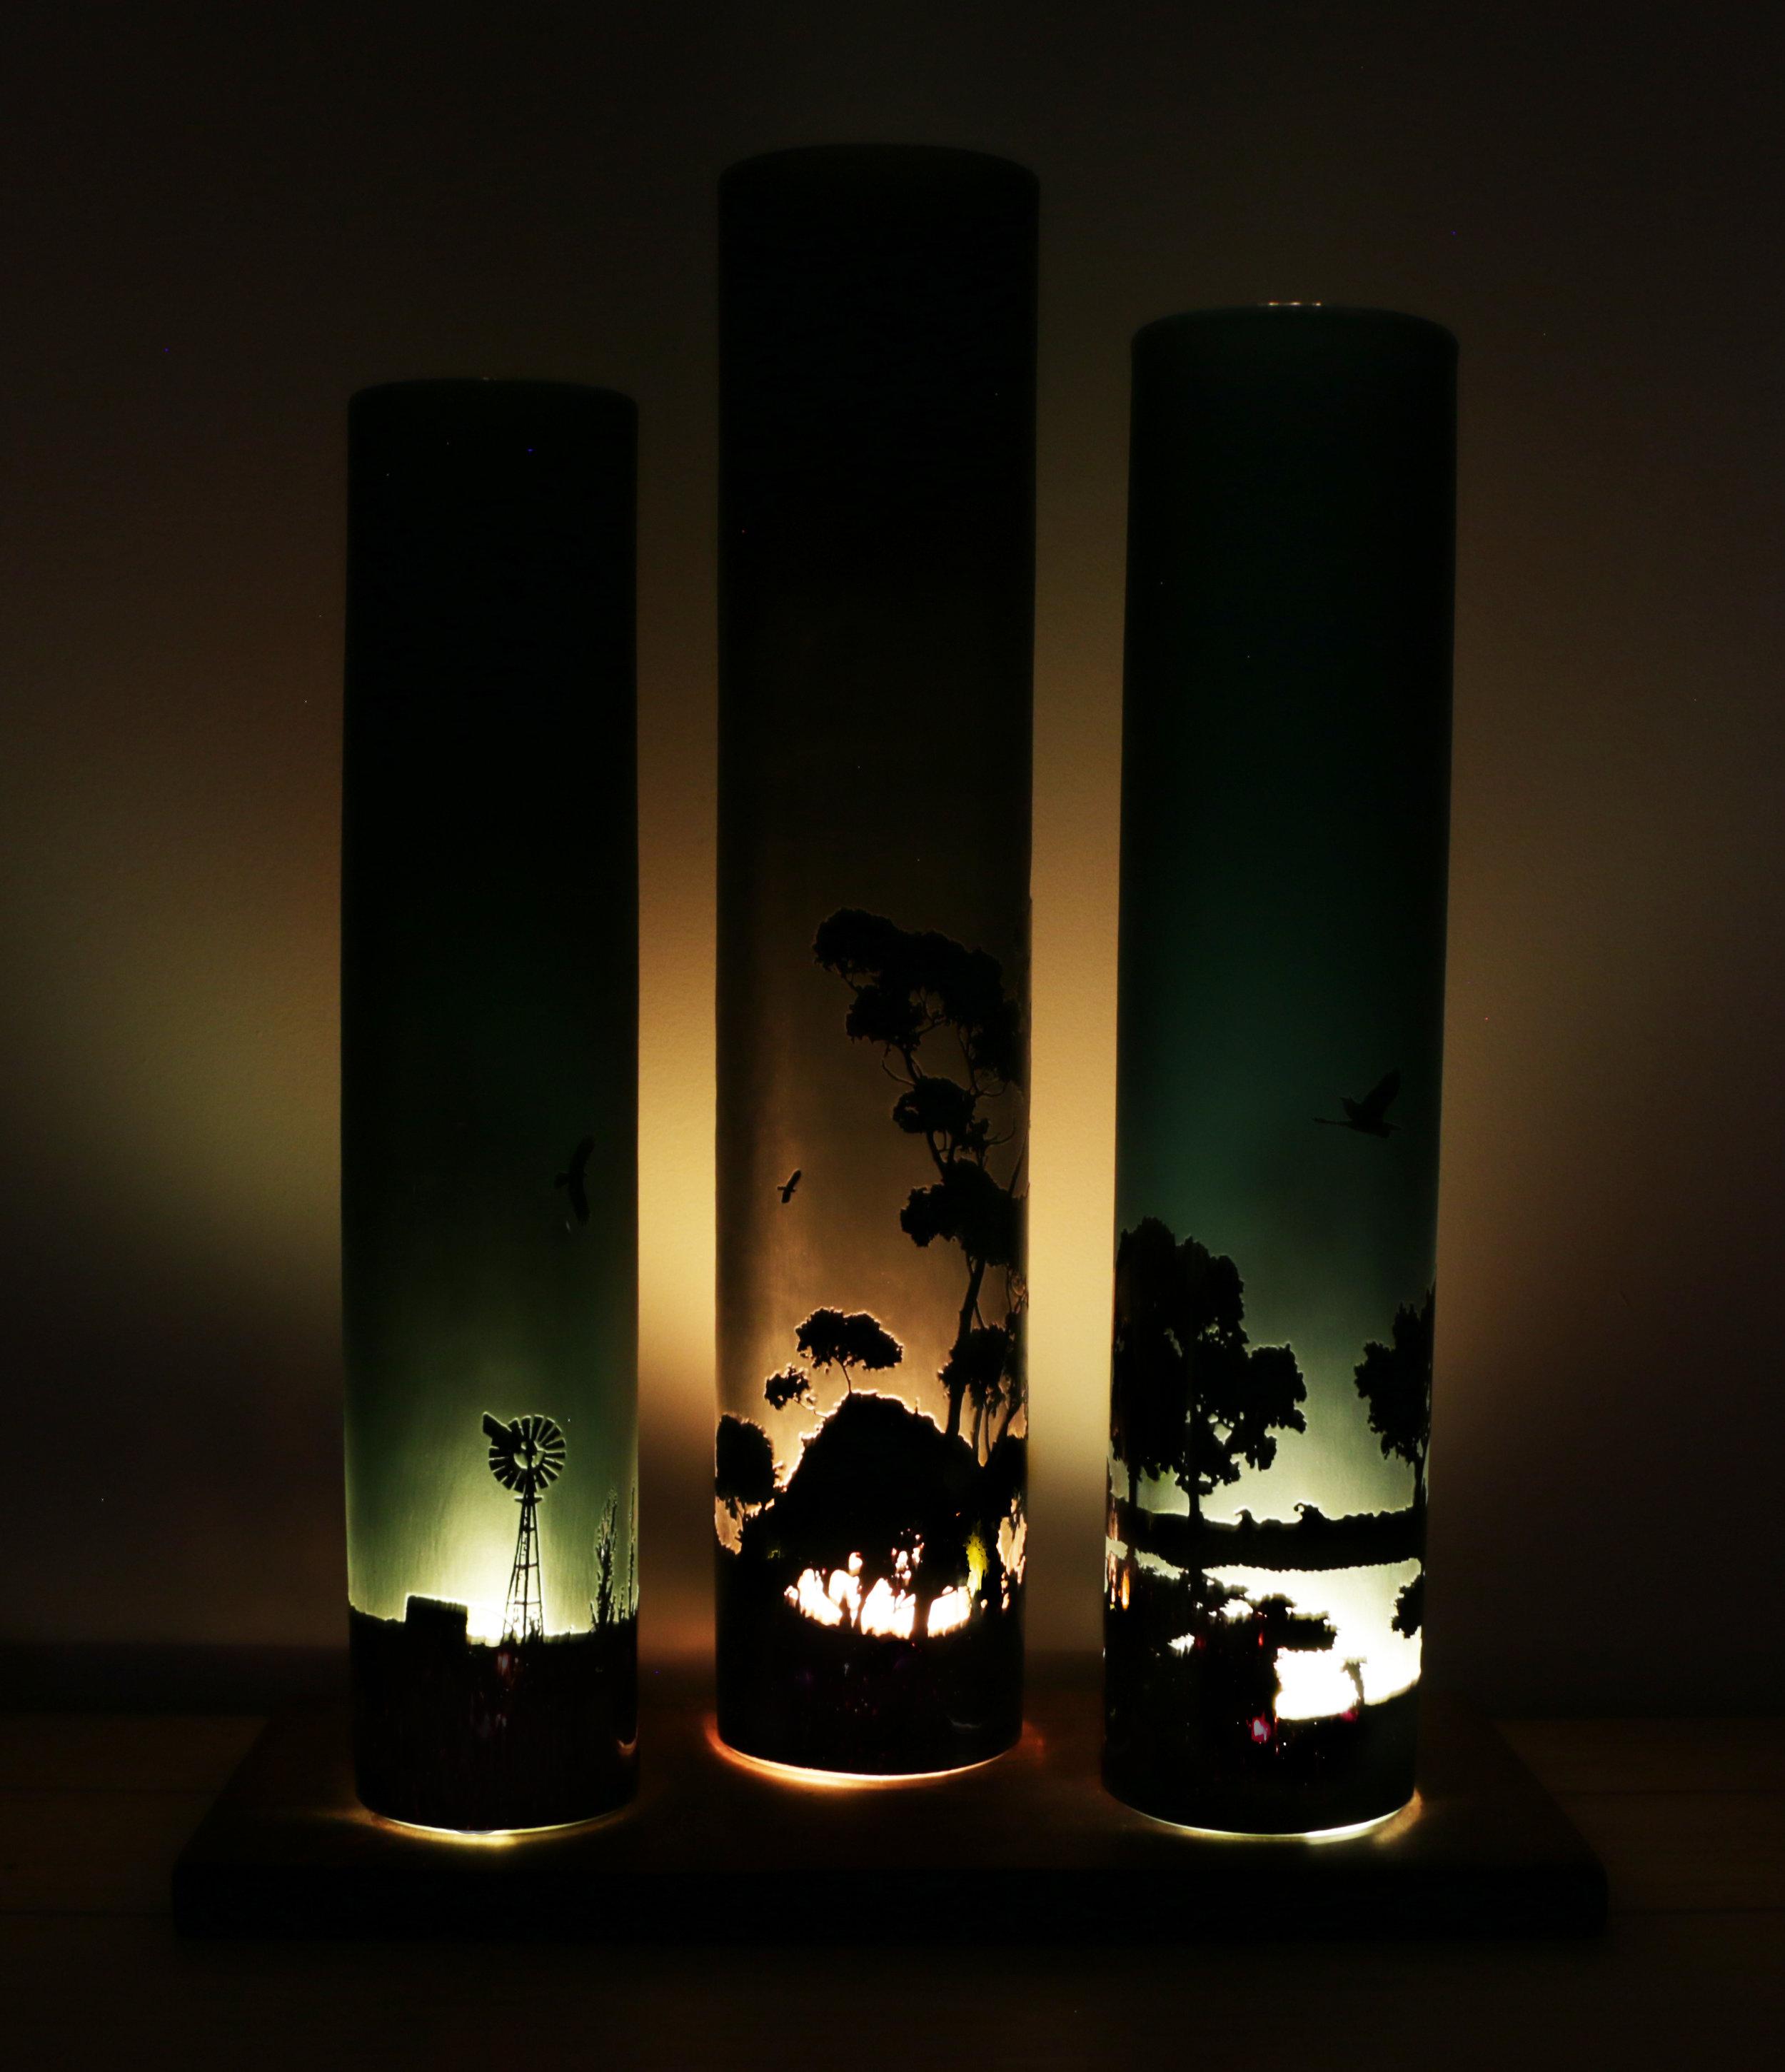 NEW - Last light